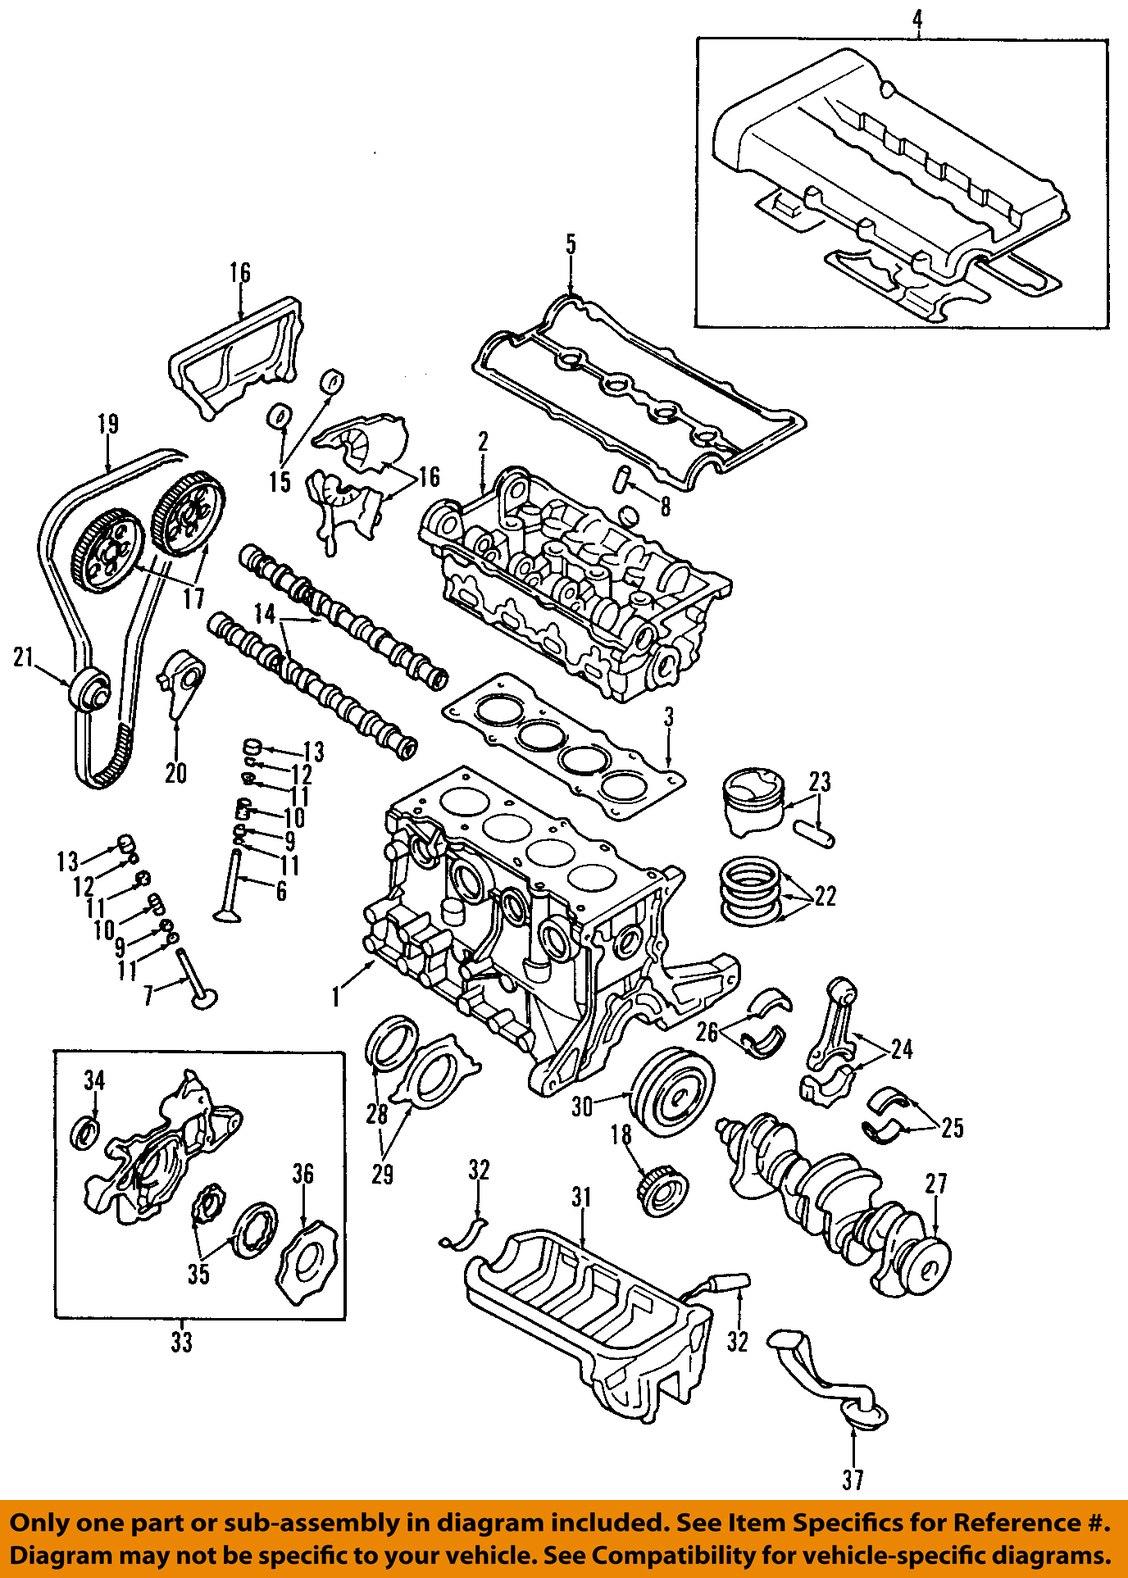 kia rio engine diagram intake wiring diagram. Black Bedroom Furniture Sets. Home Design Ideas